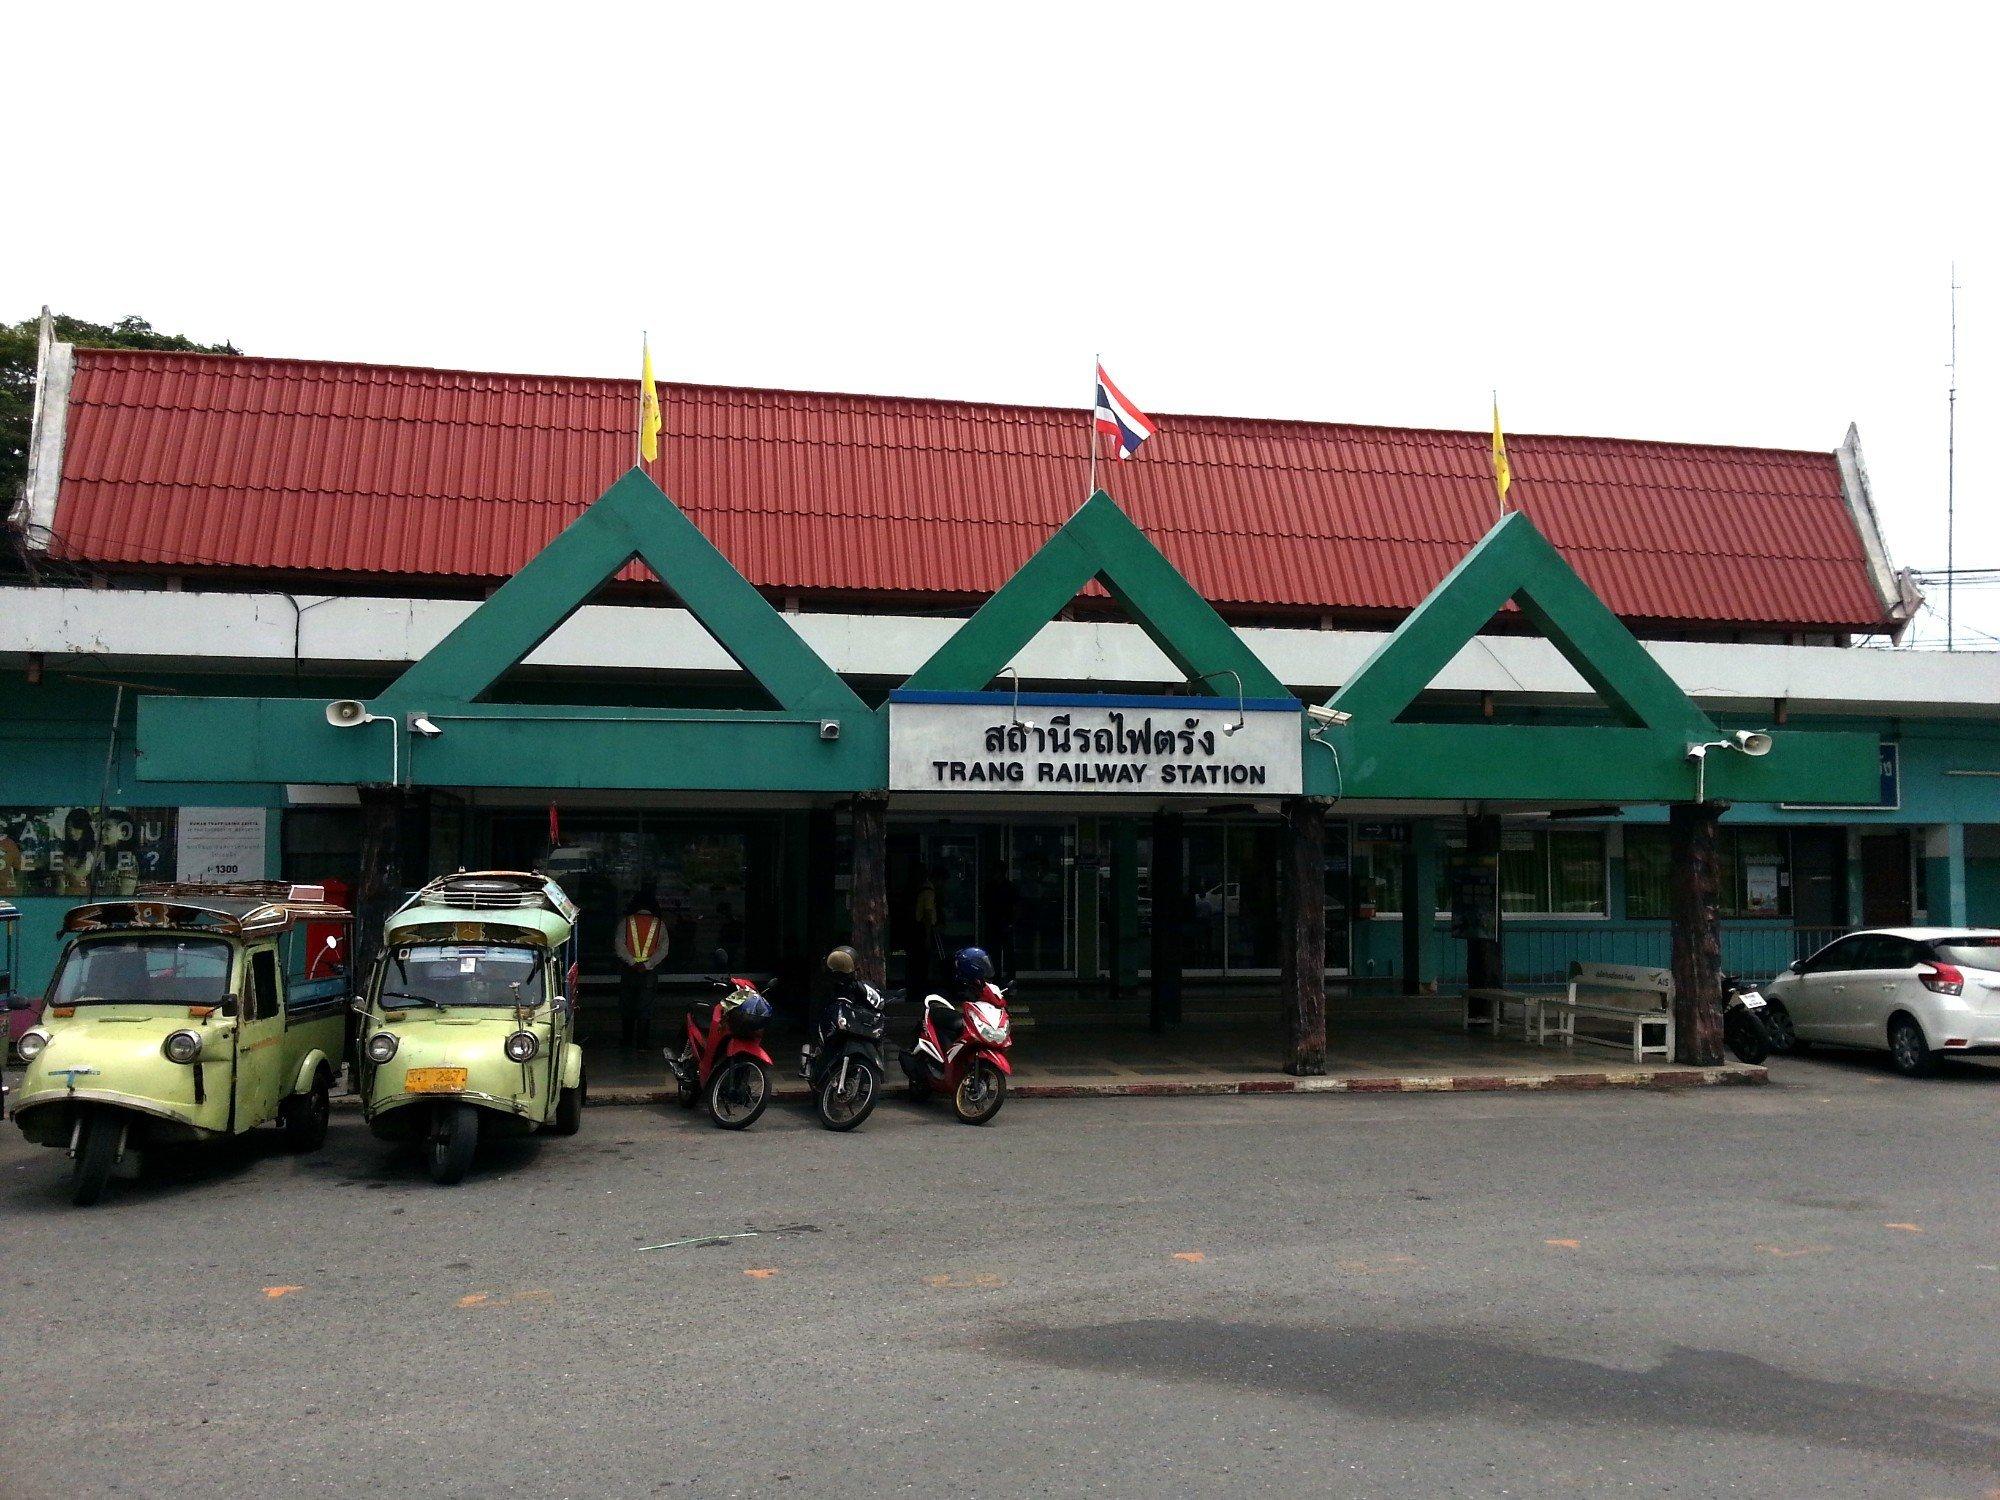 Trang Railway Station